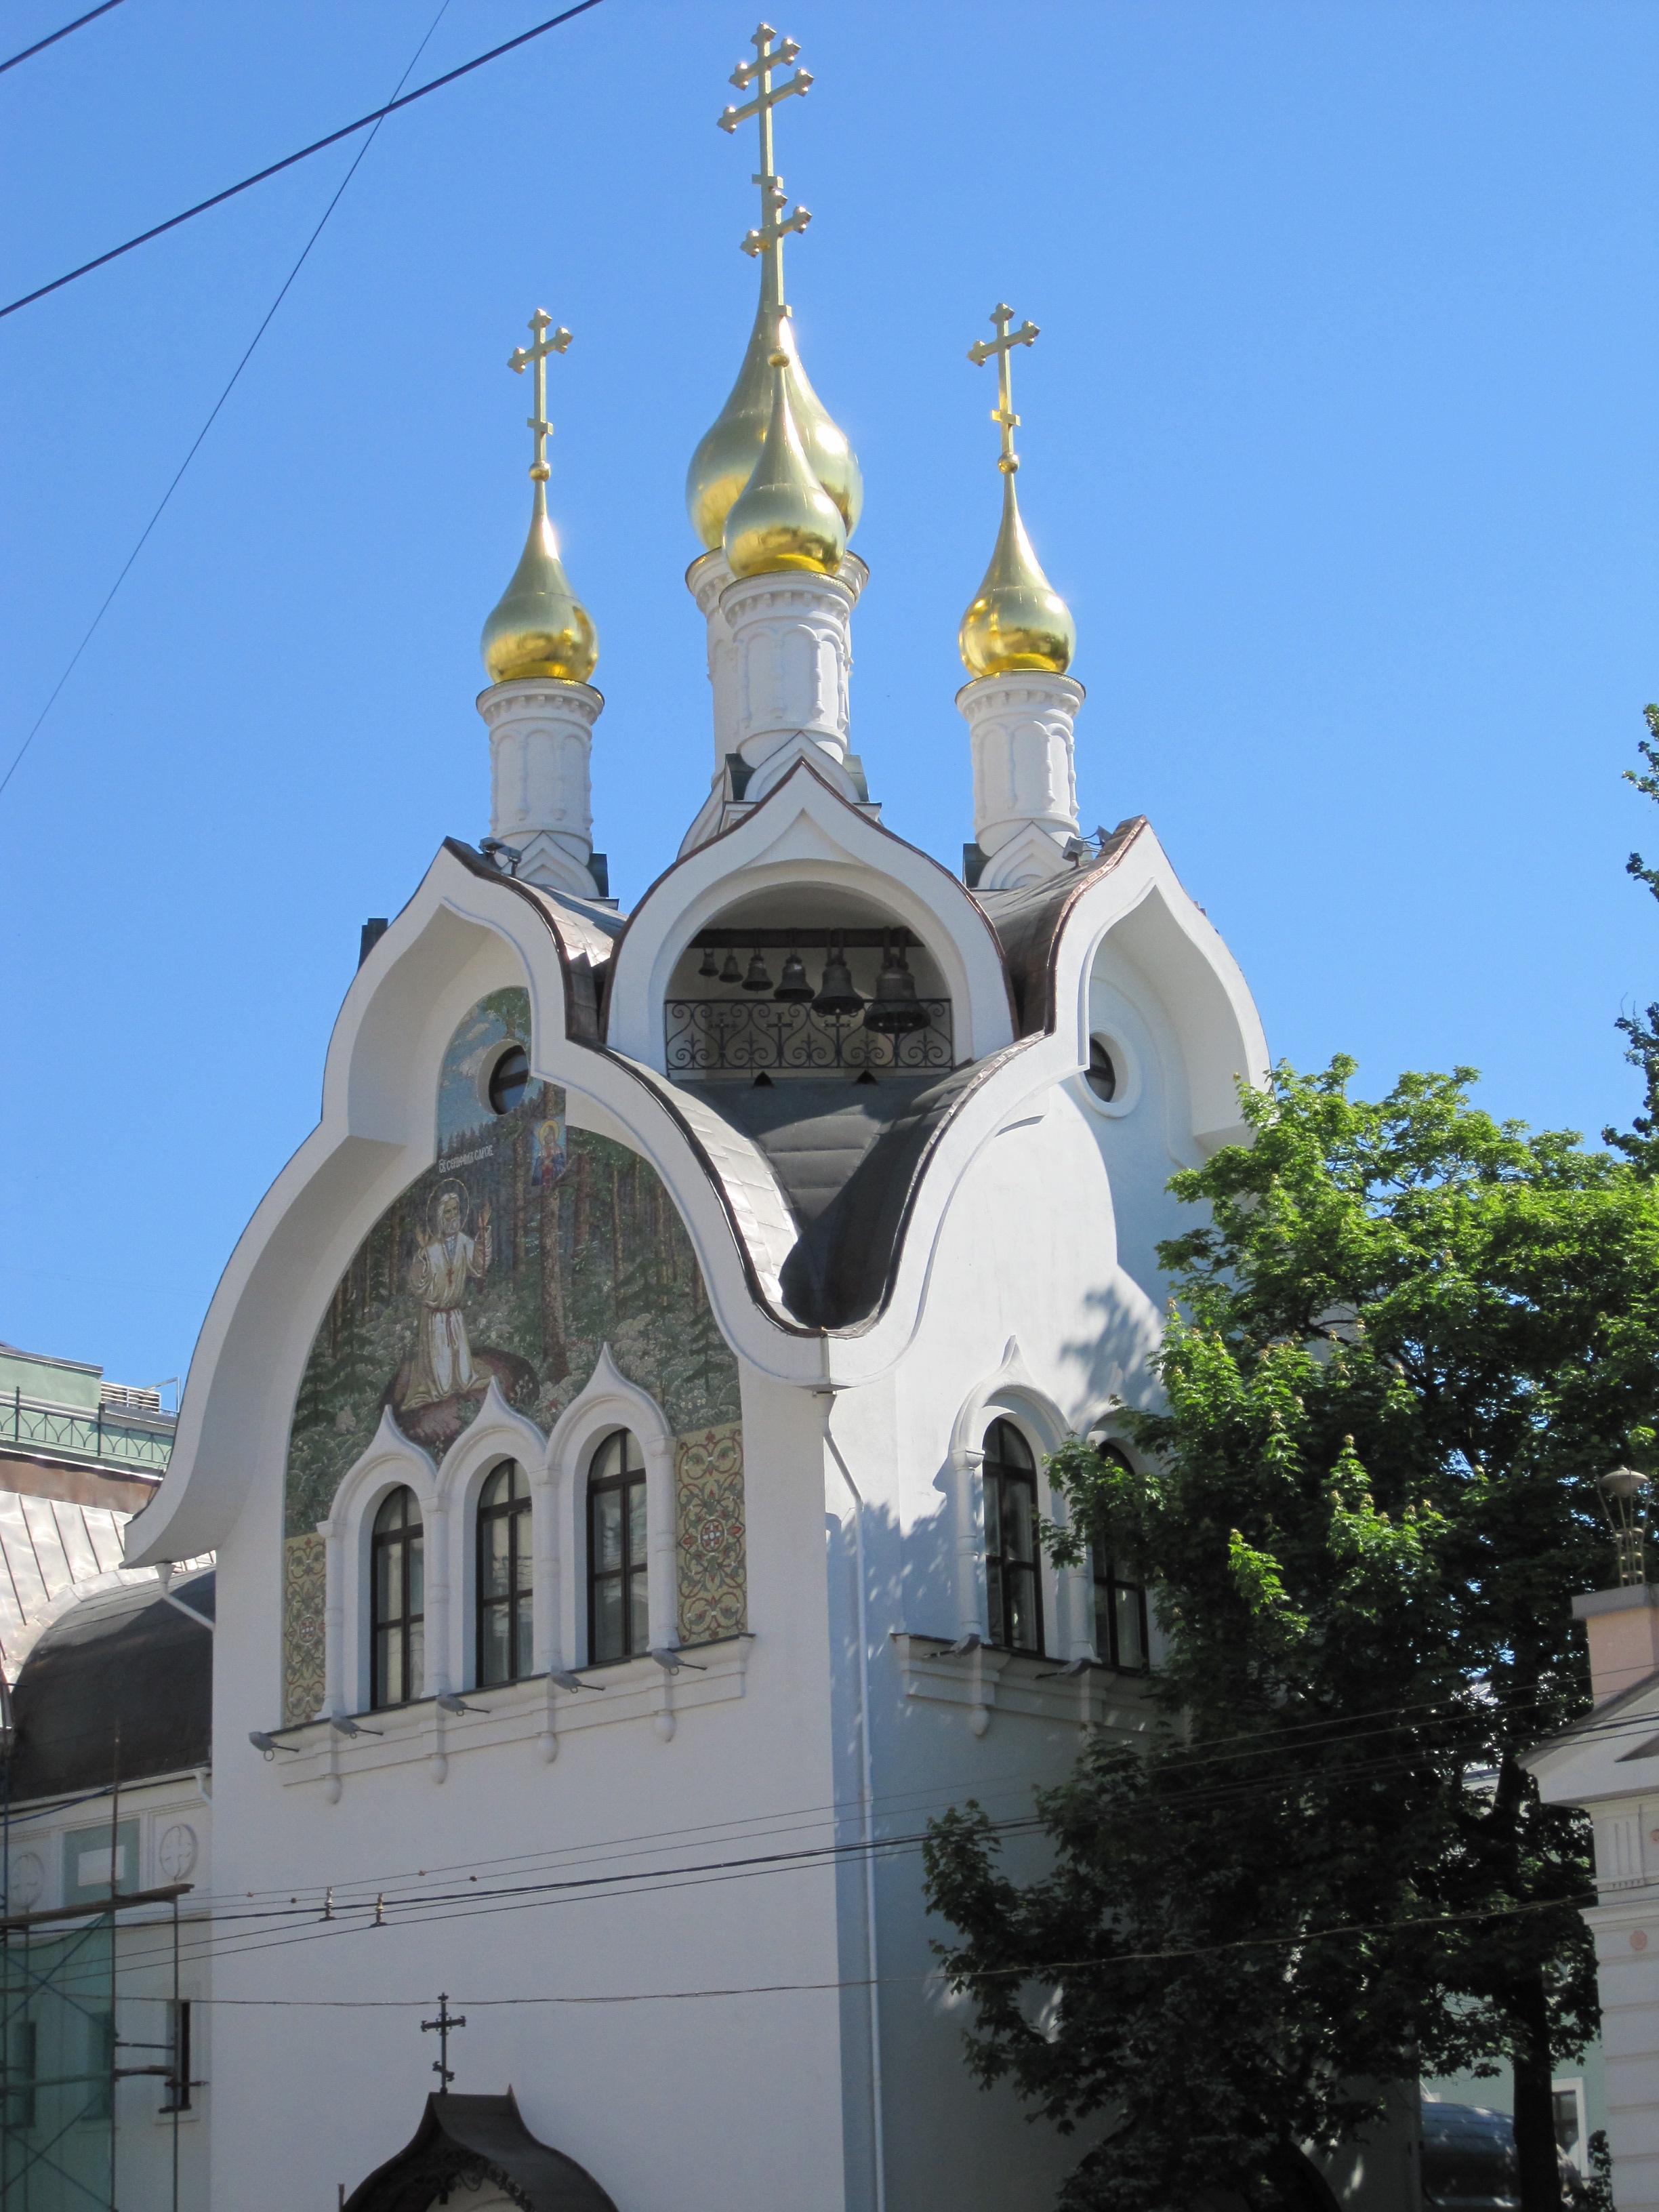 newly-restored-church-on-prospektmira